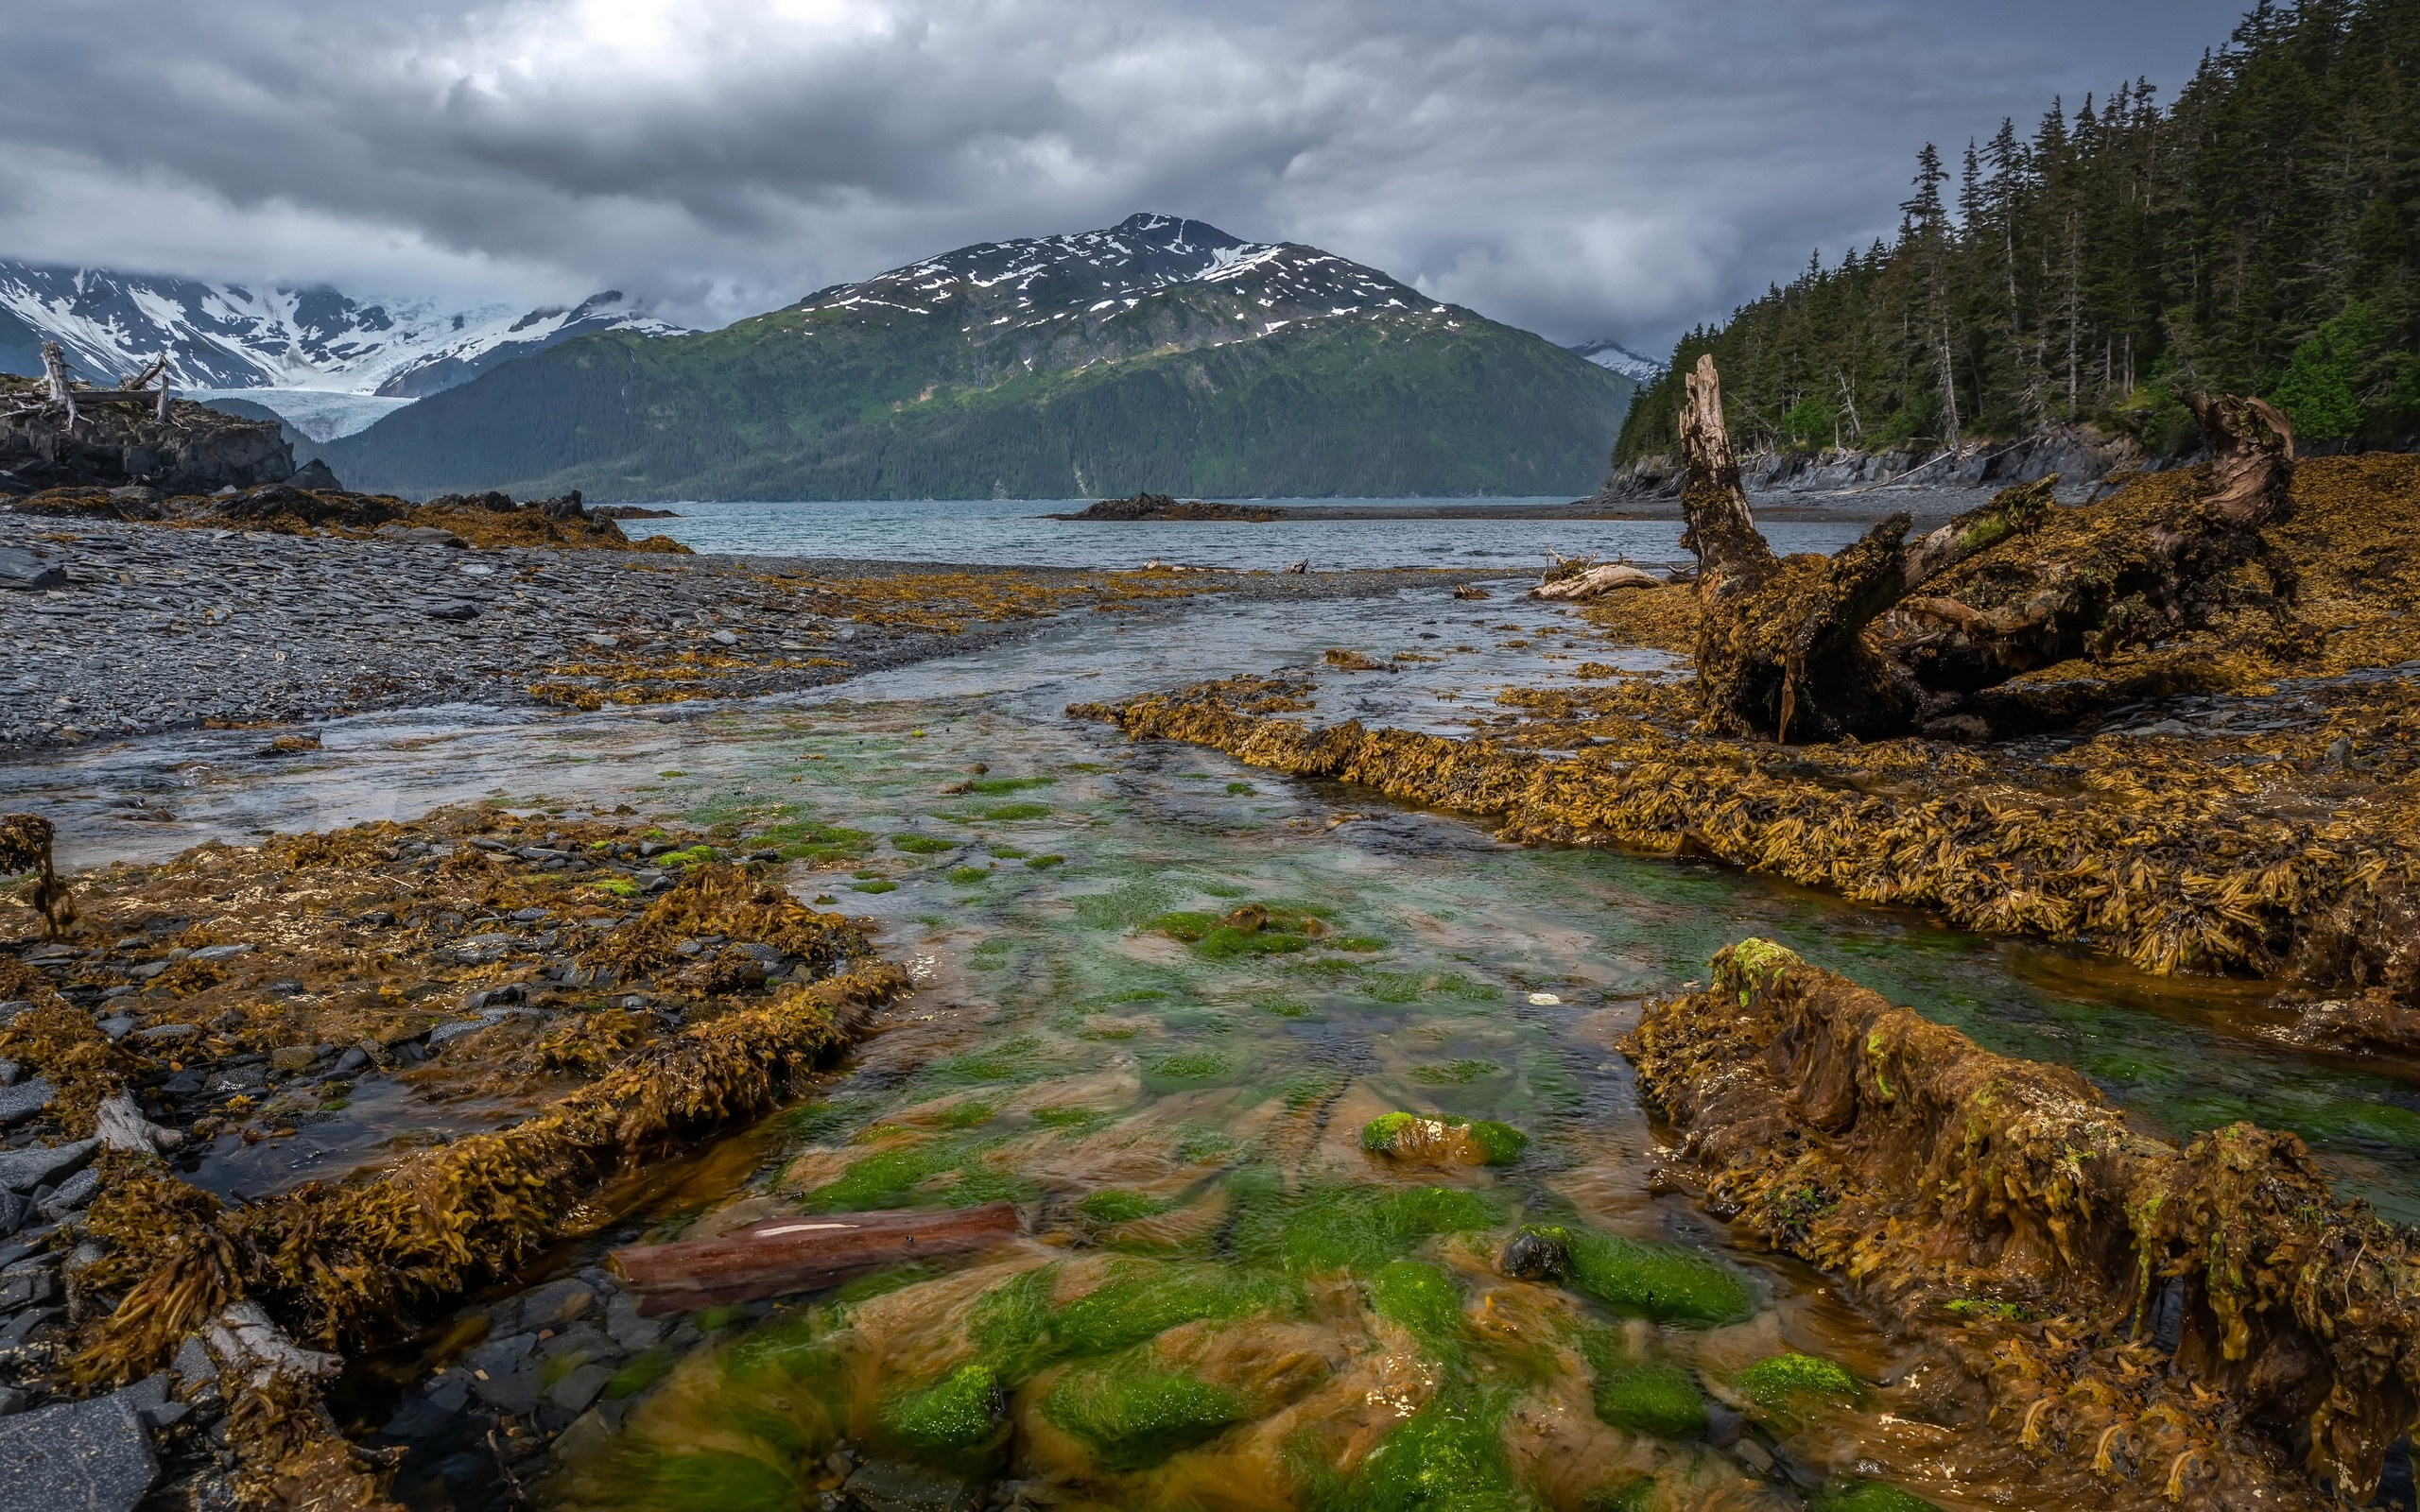 аляска, горы, камни, река, лес, whittier, природа